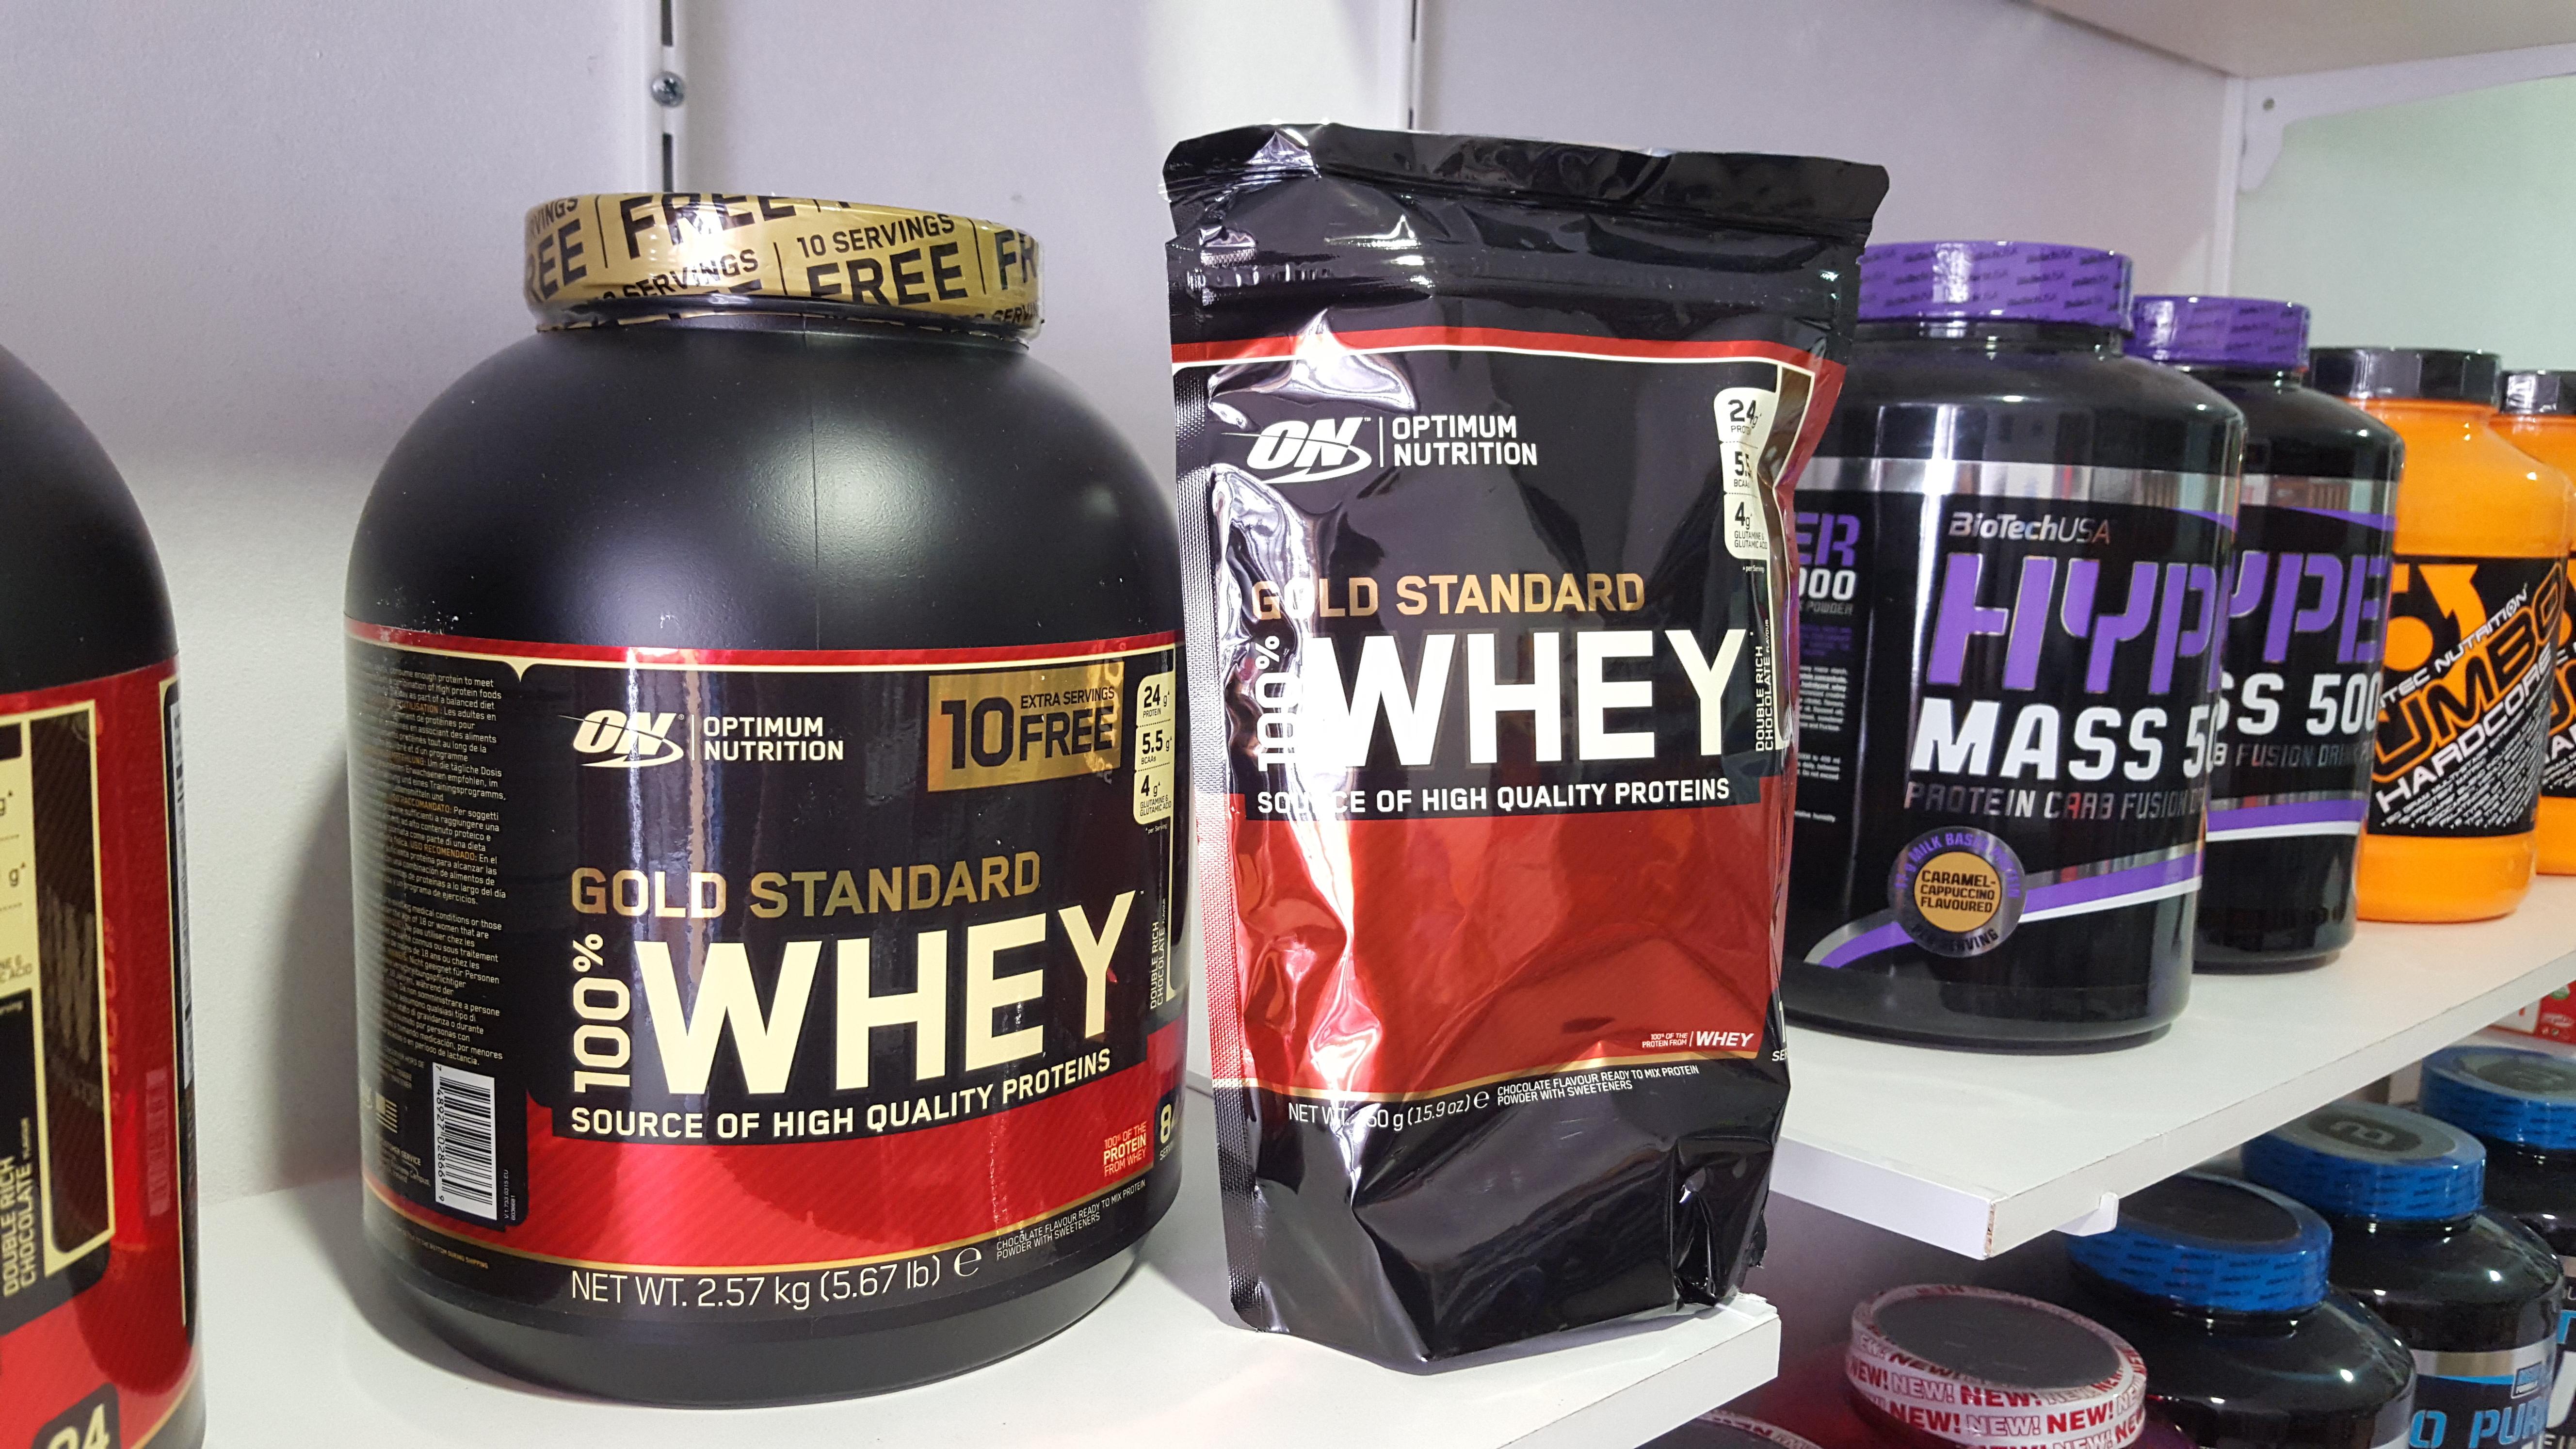 proteine-pas-cher-conseils-nutriperfs-whey-gold-standard